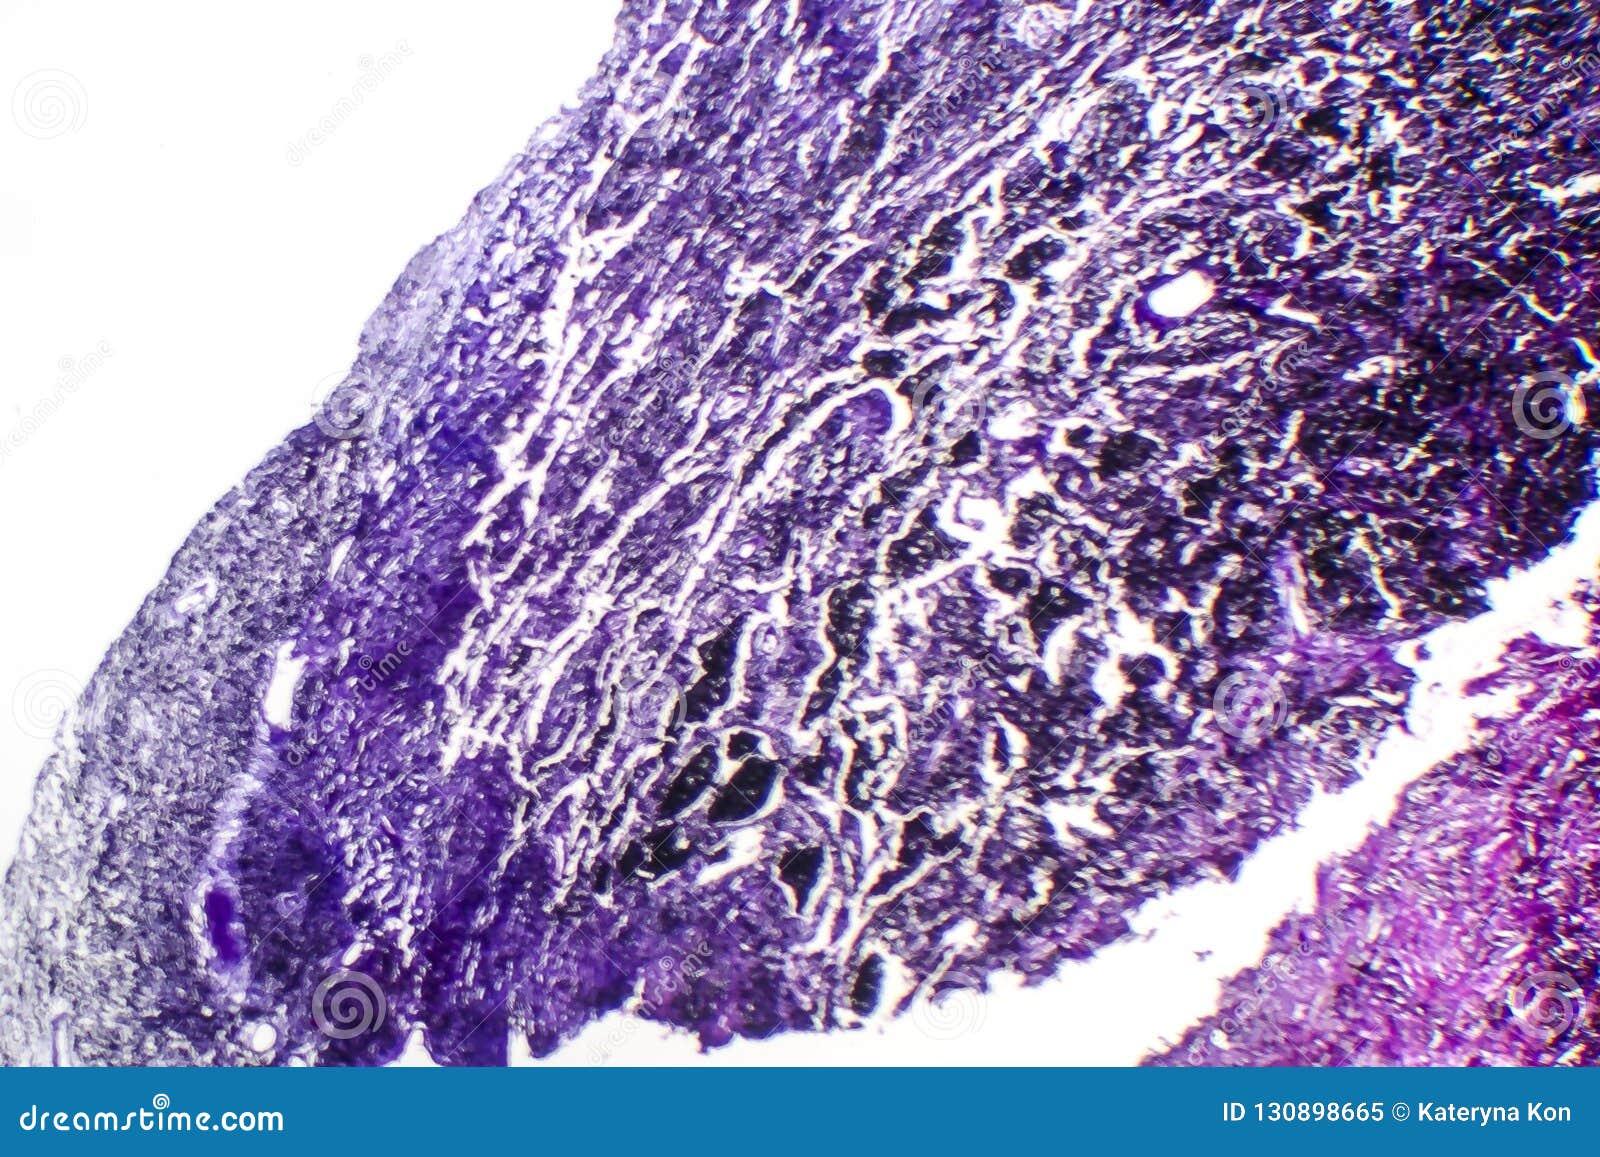 Histopathology av silikons, ljus micrograph